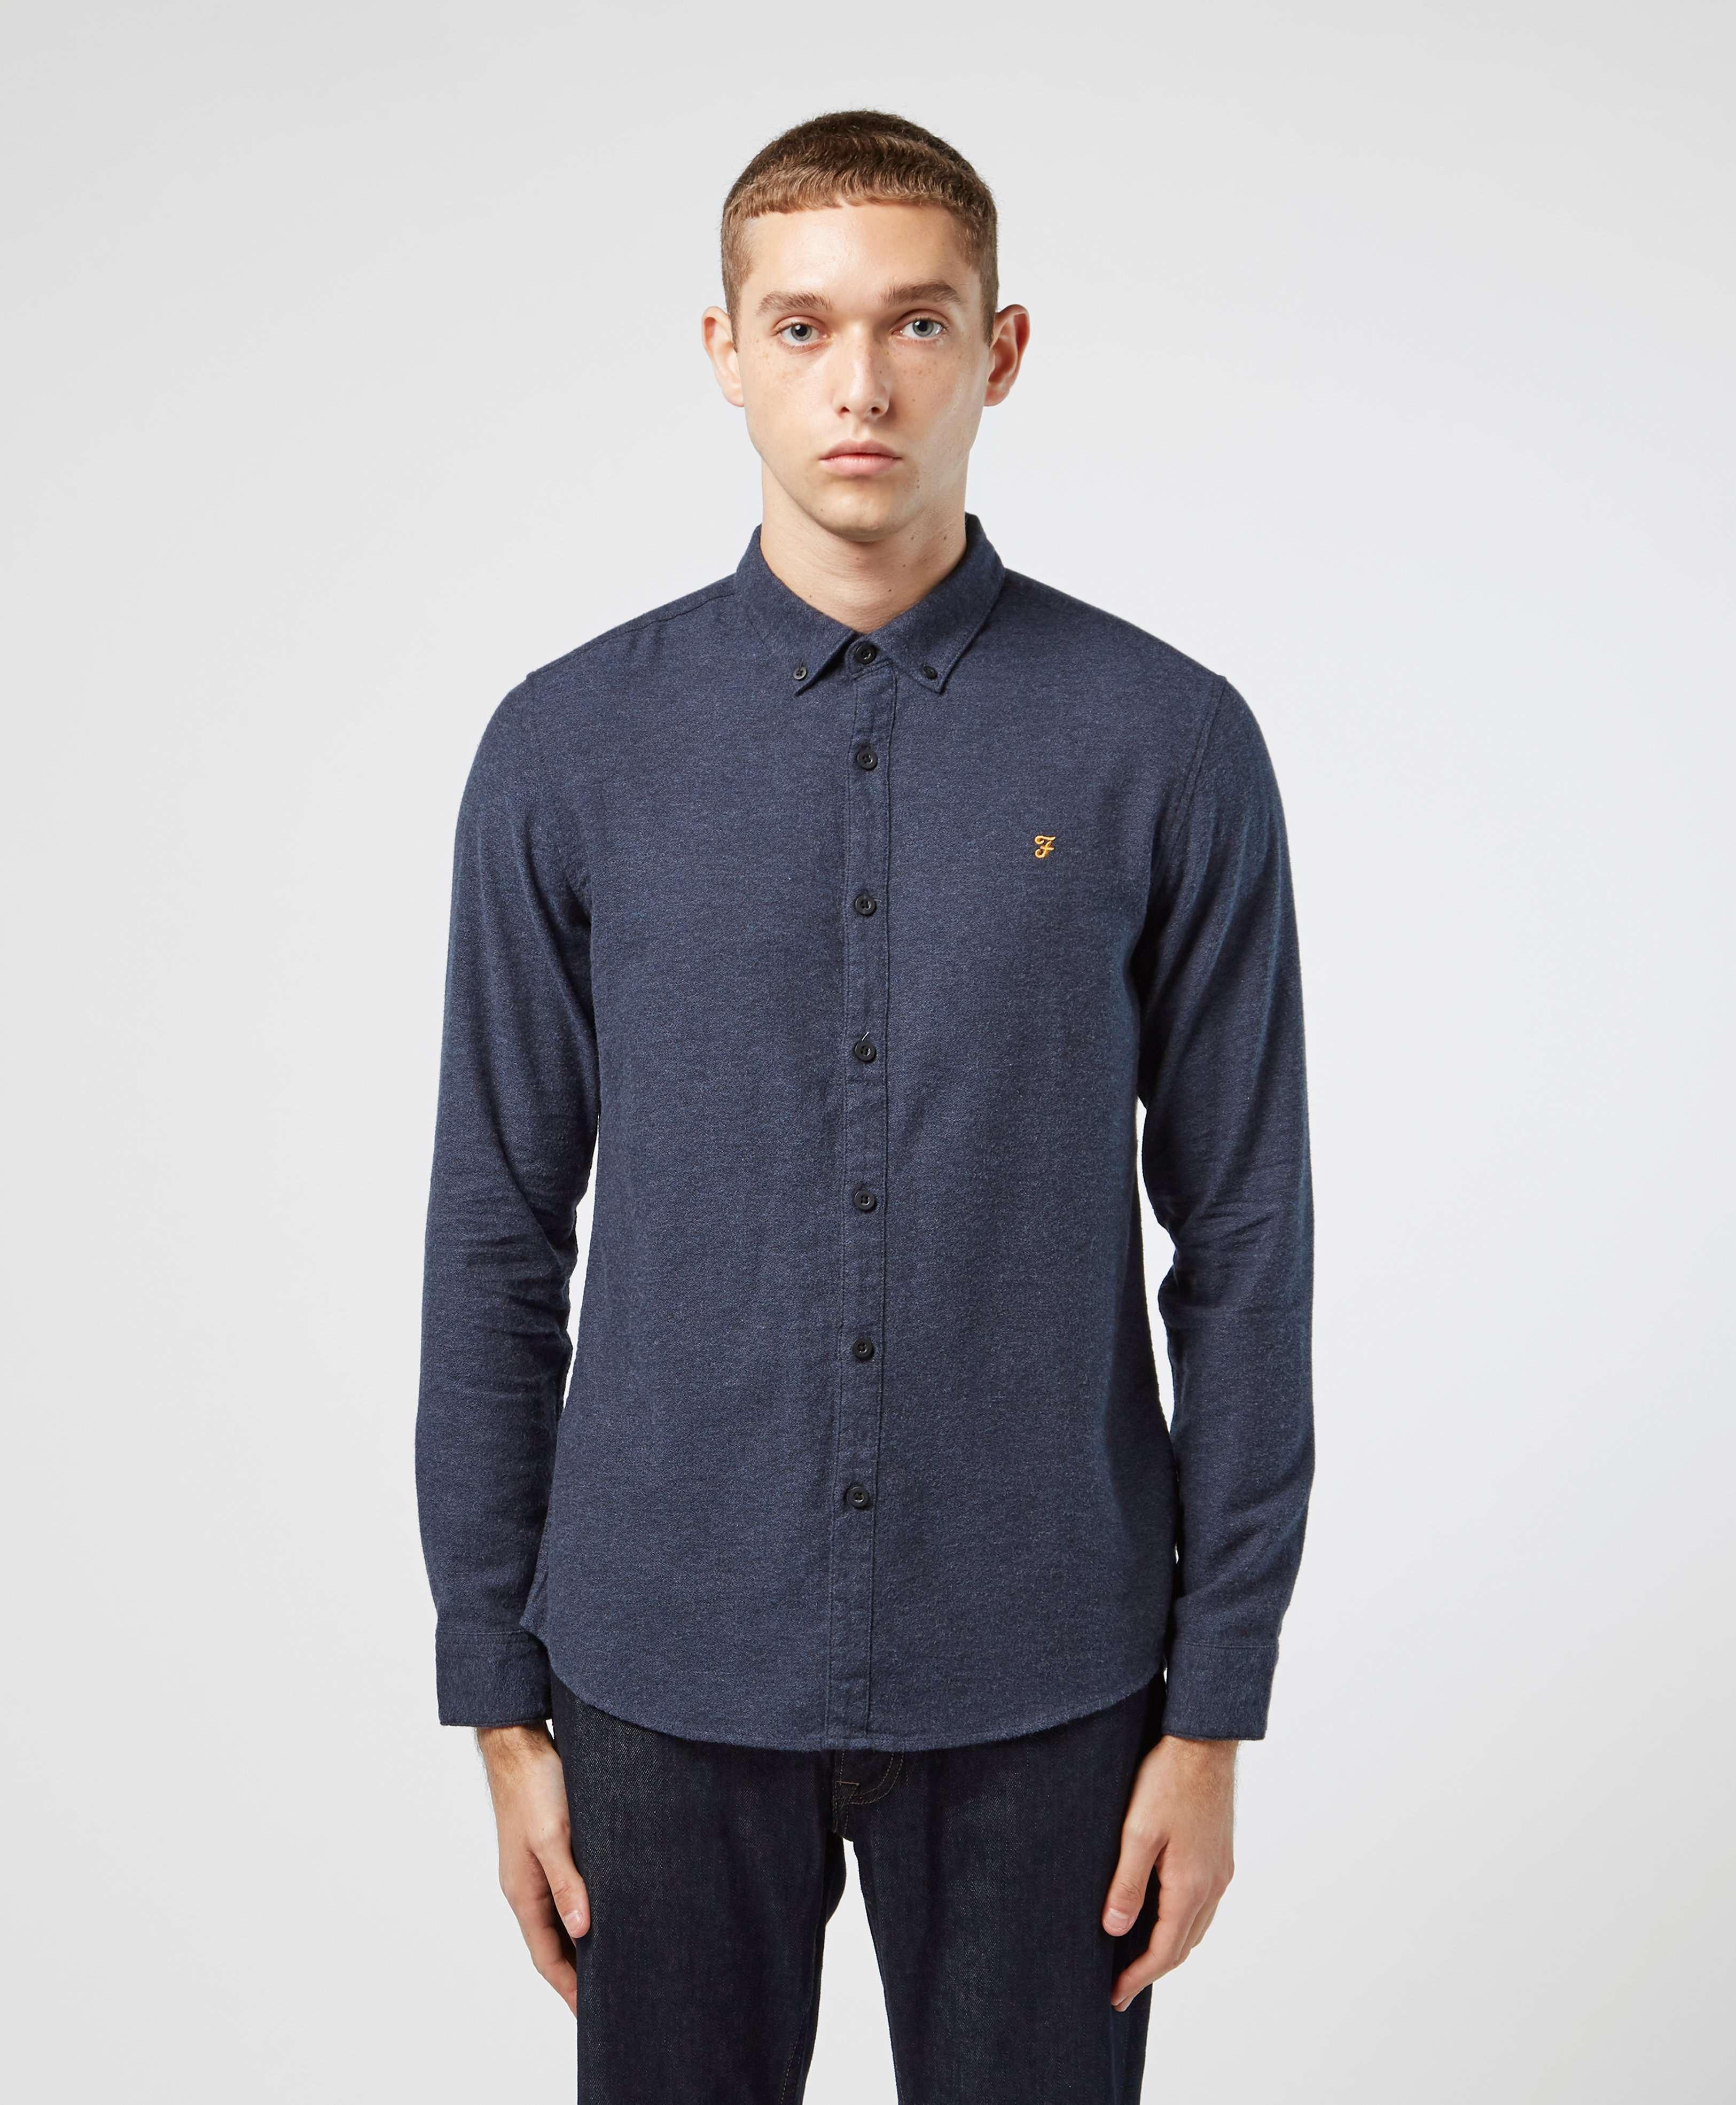 Farah Long Sleeve Oxford Shirt